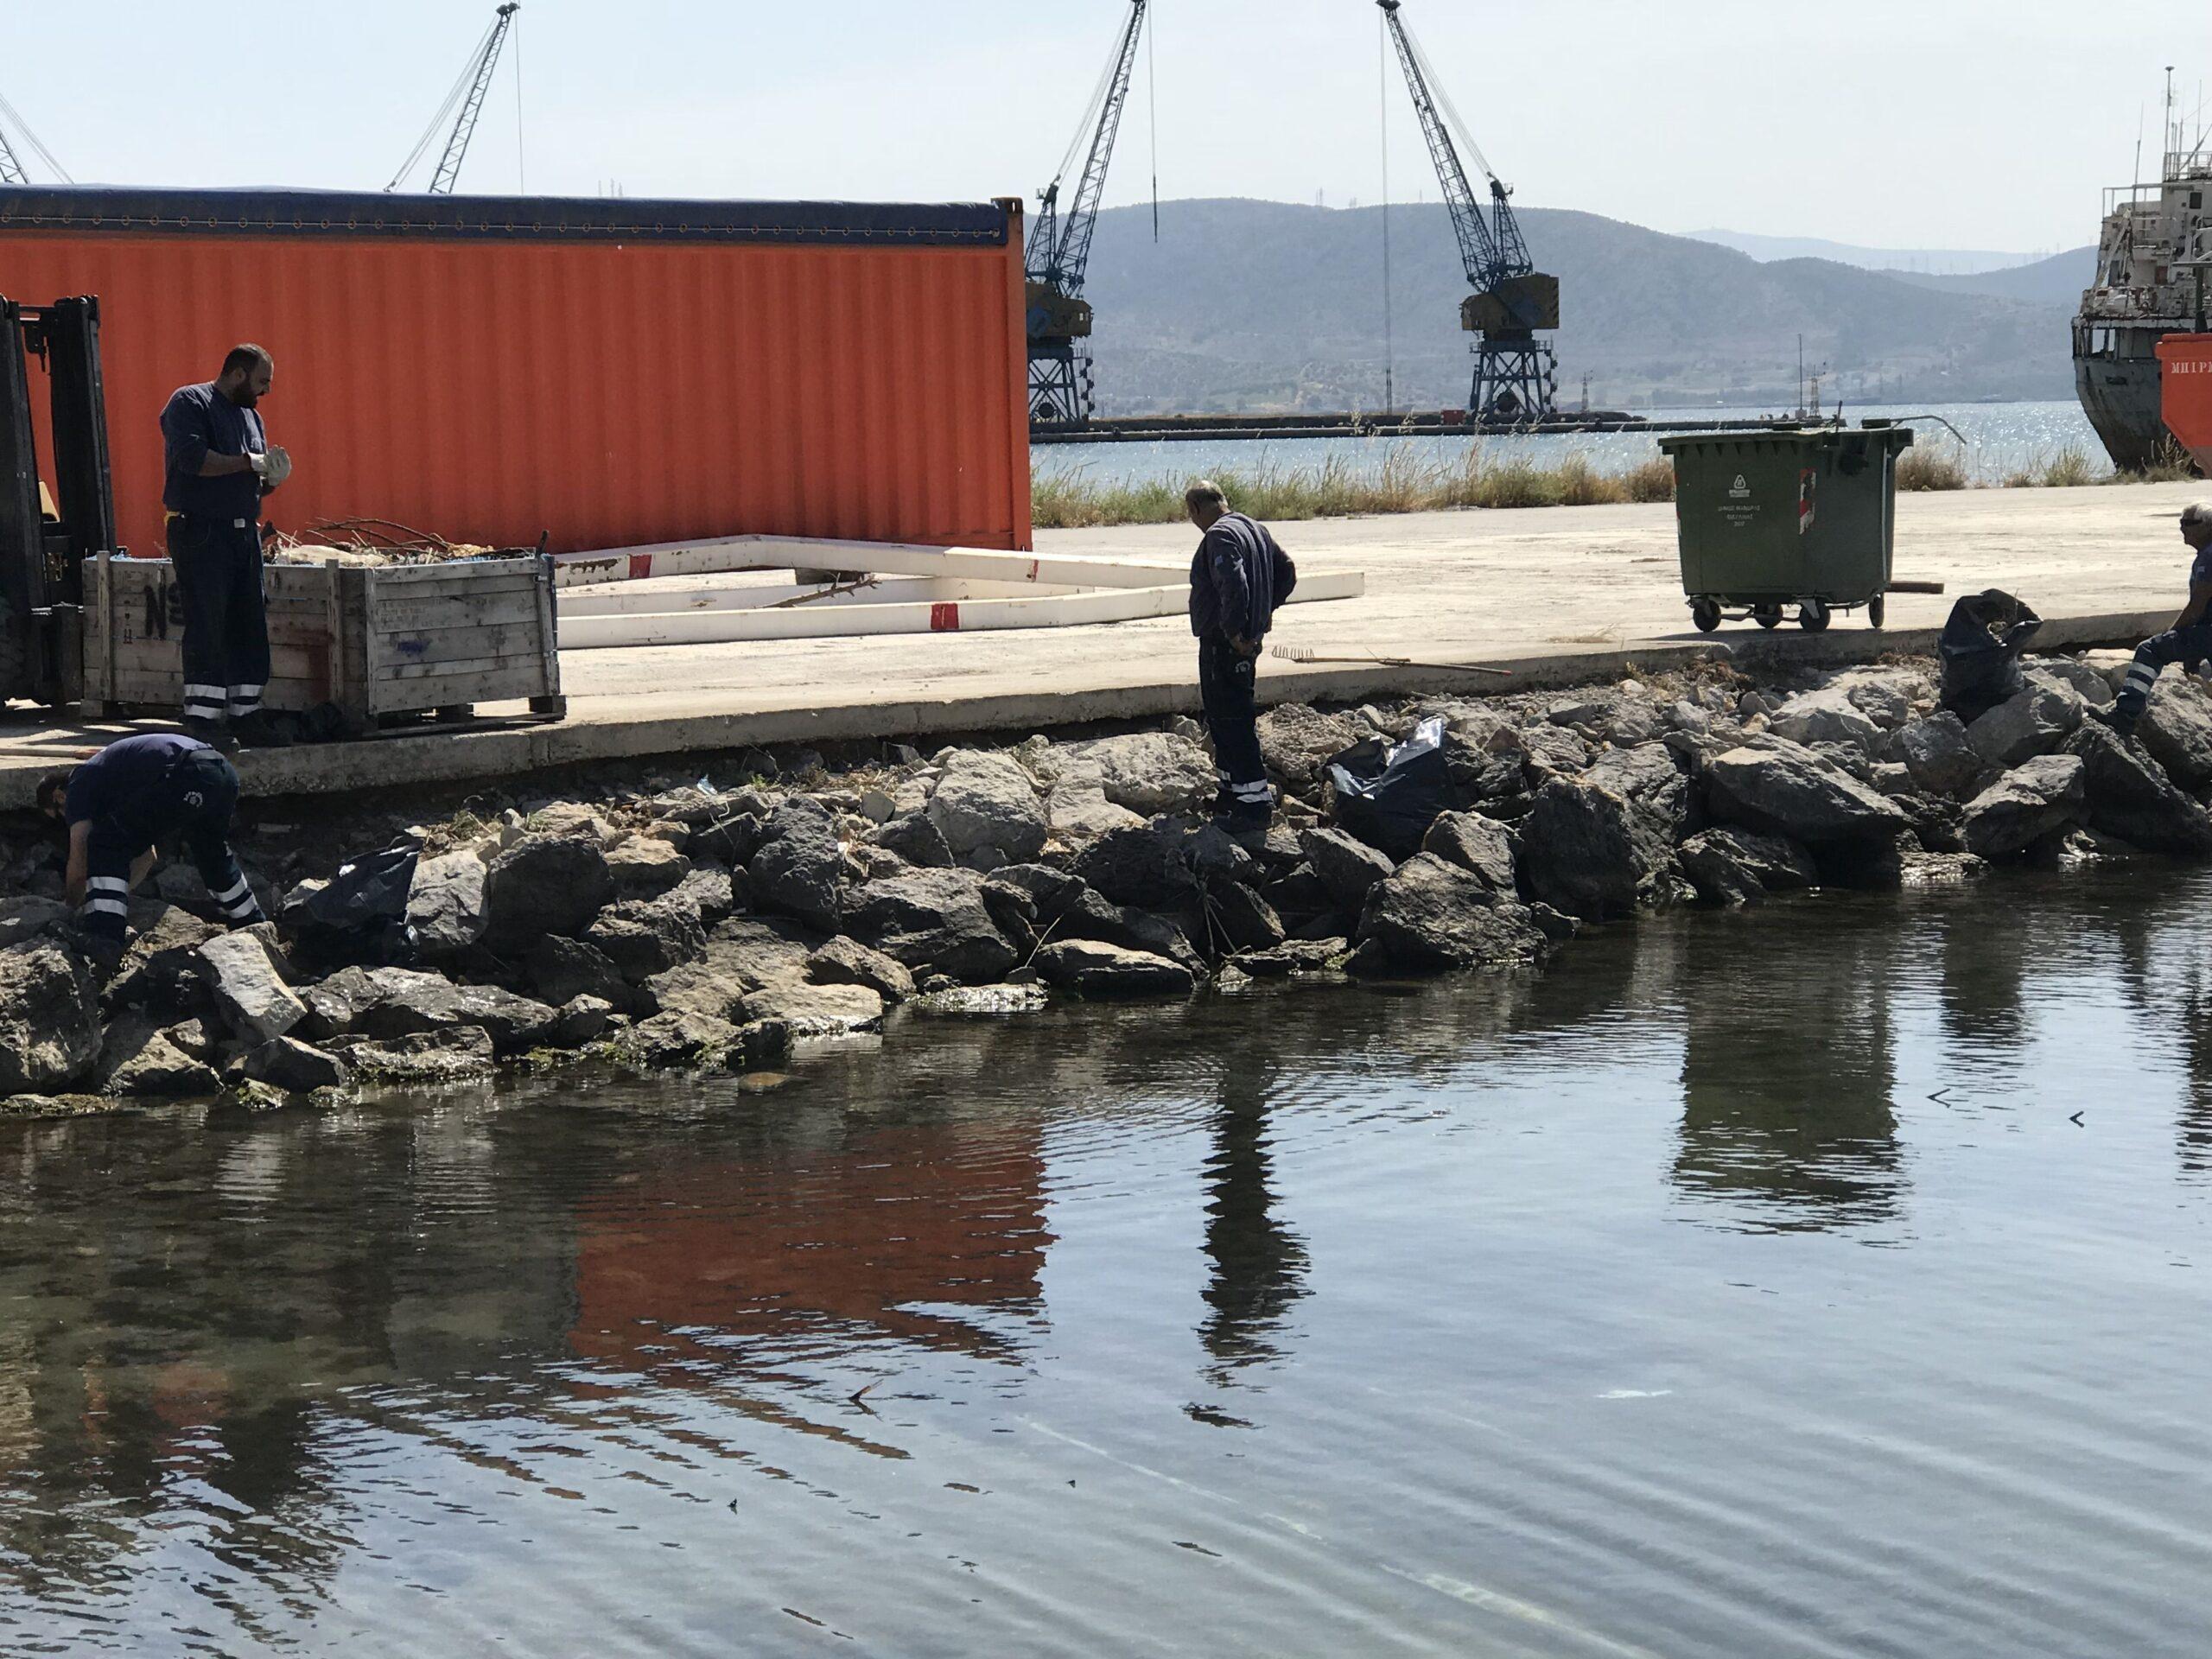 You are currently viewing Εργασίες Καθαρισμού της παράκτιας περιοχής στη θέση Καλυμπάκι, από την εταιρεία Assodivers